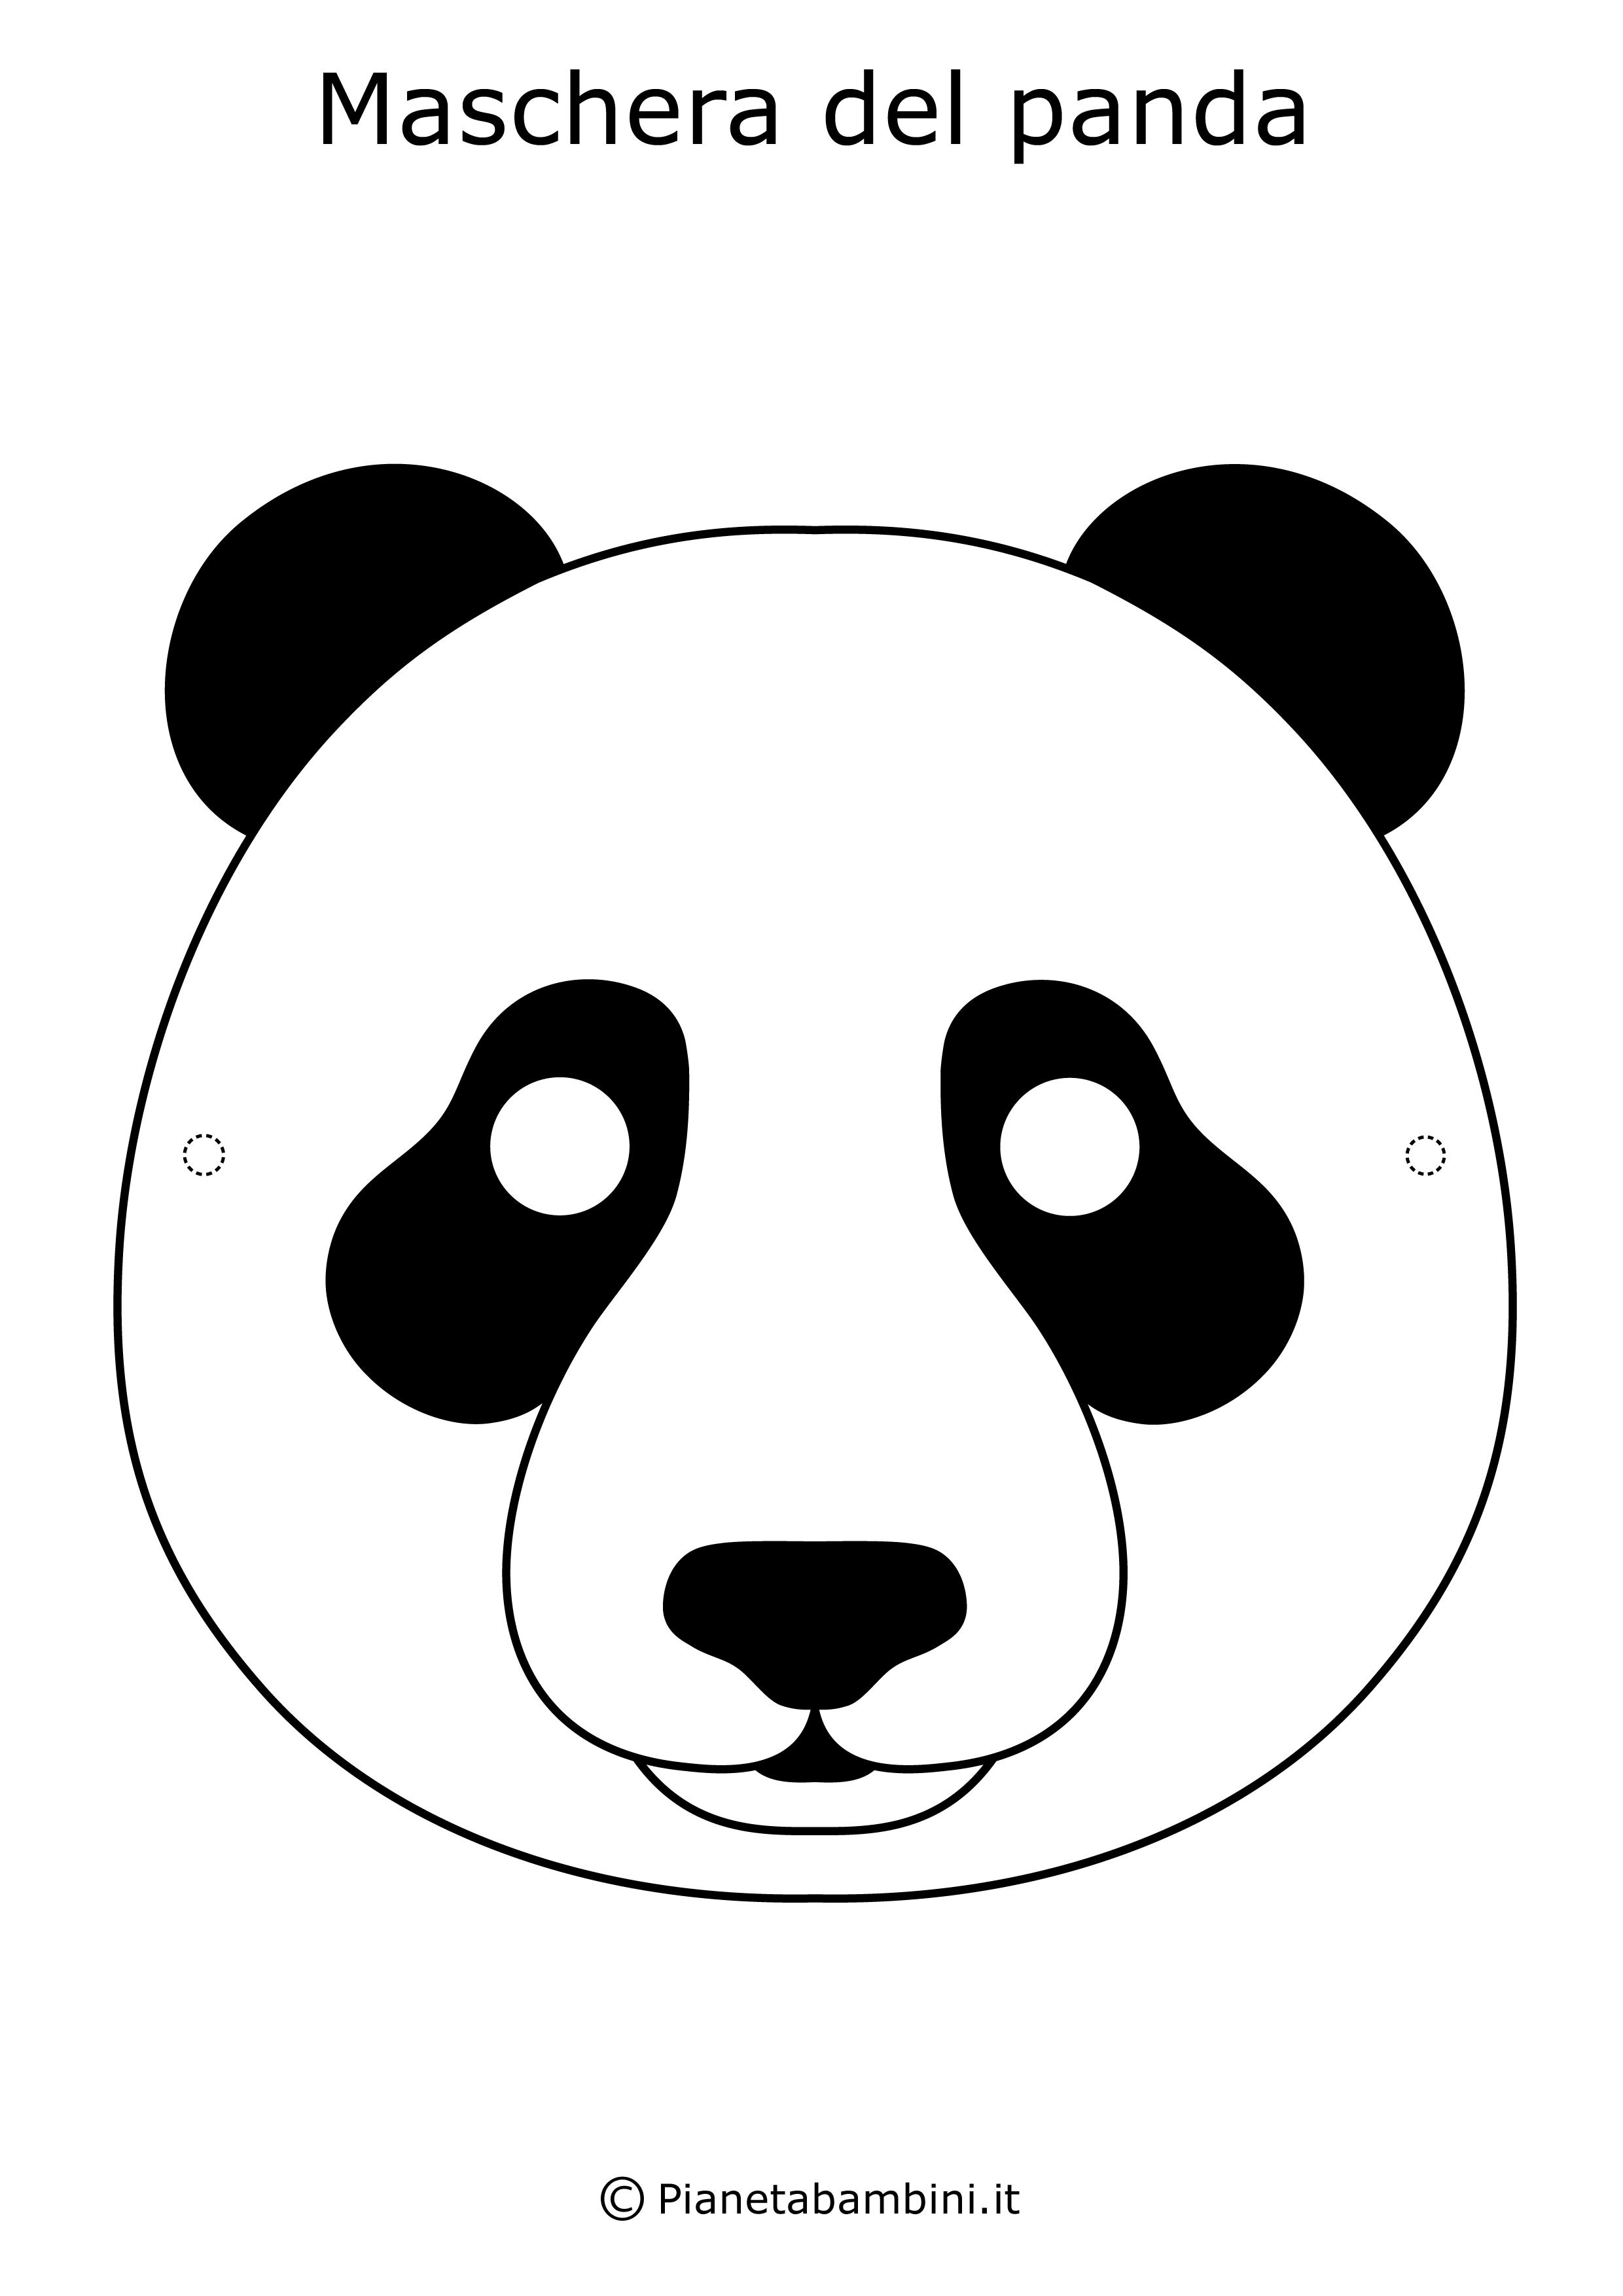 Immagine della maschera da panda